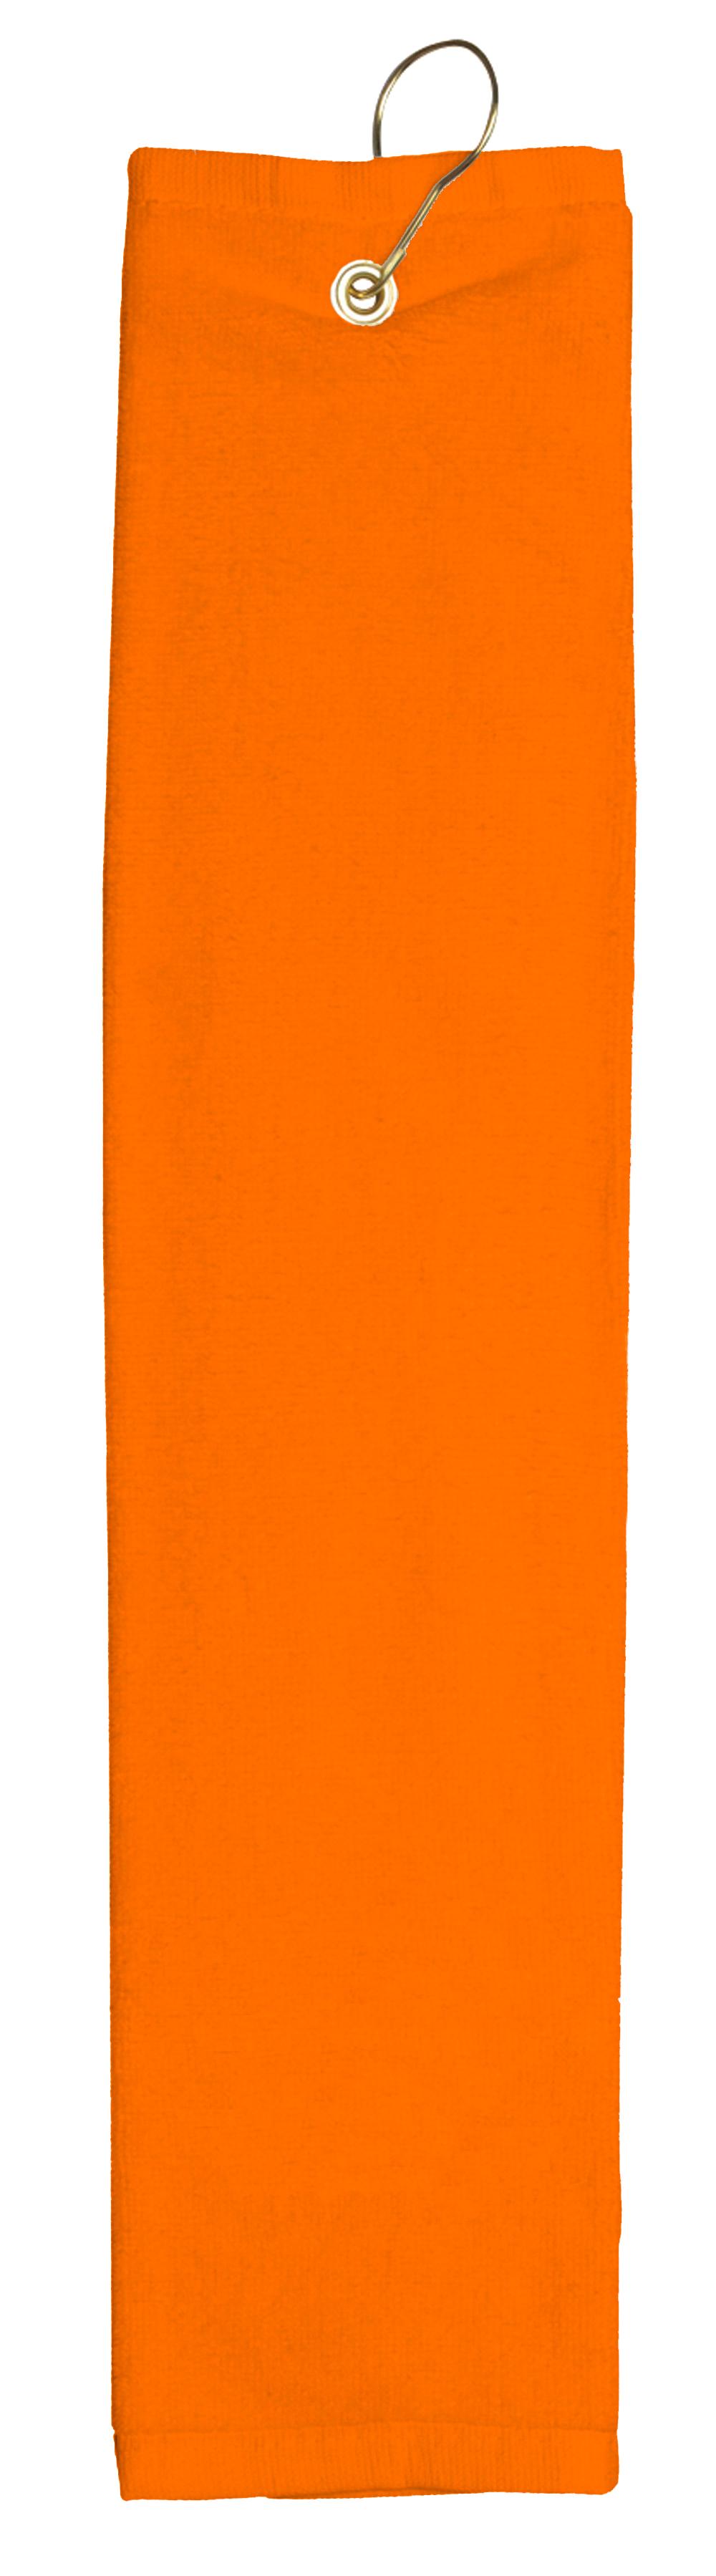 TRU24TG_Orange